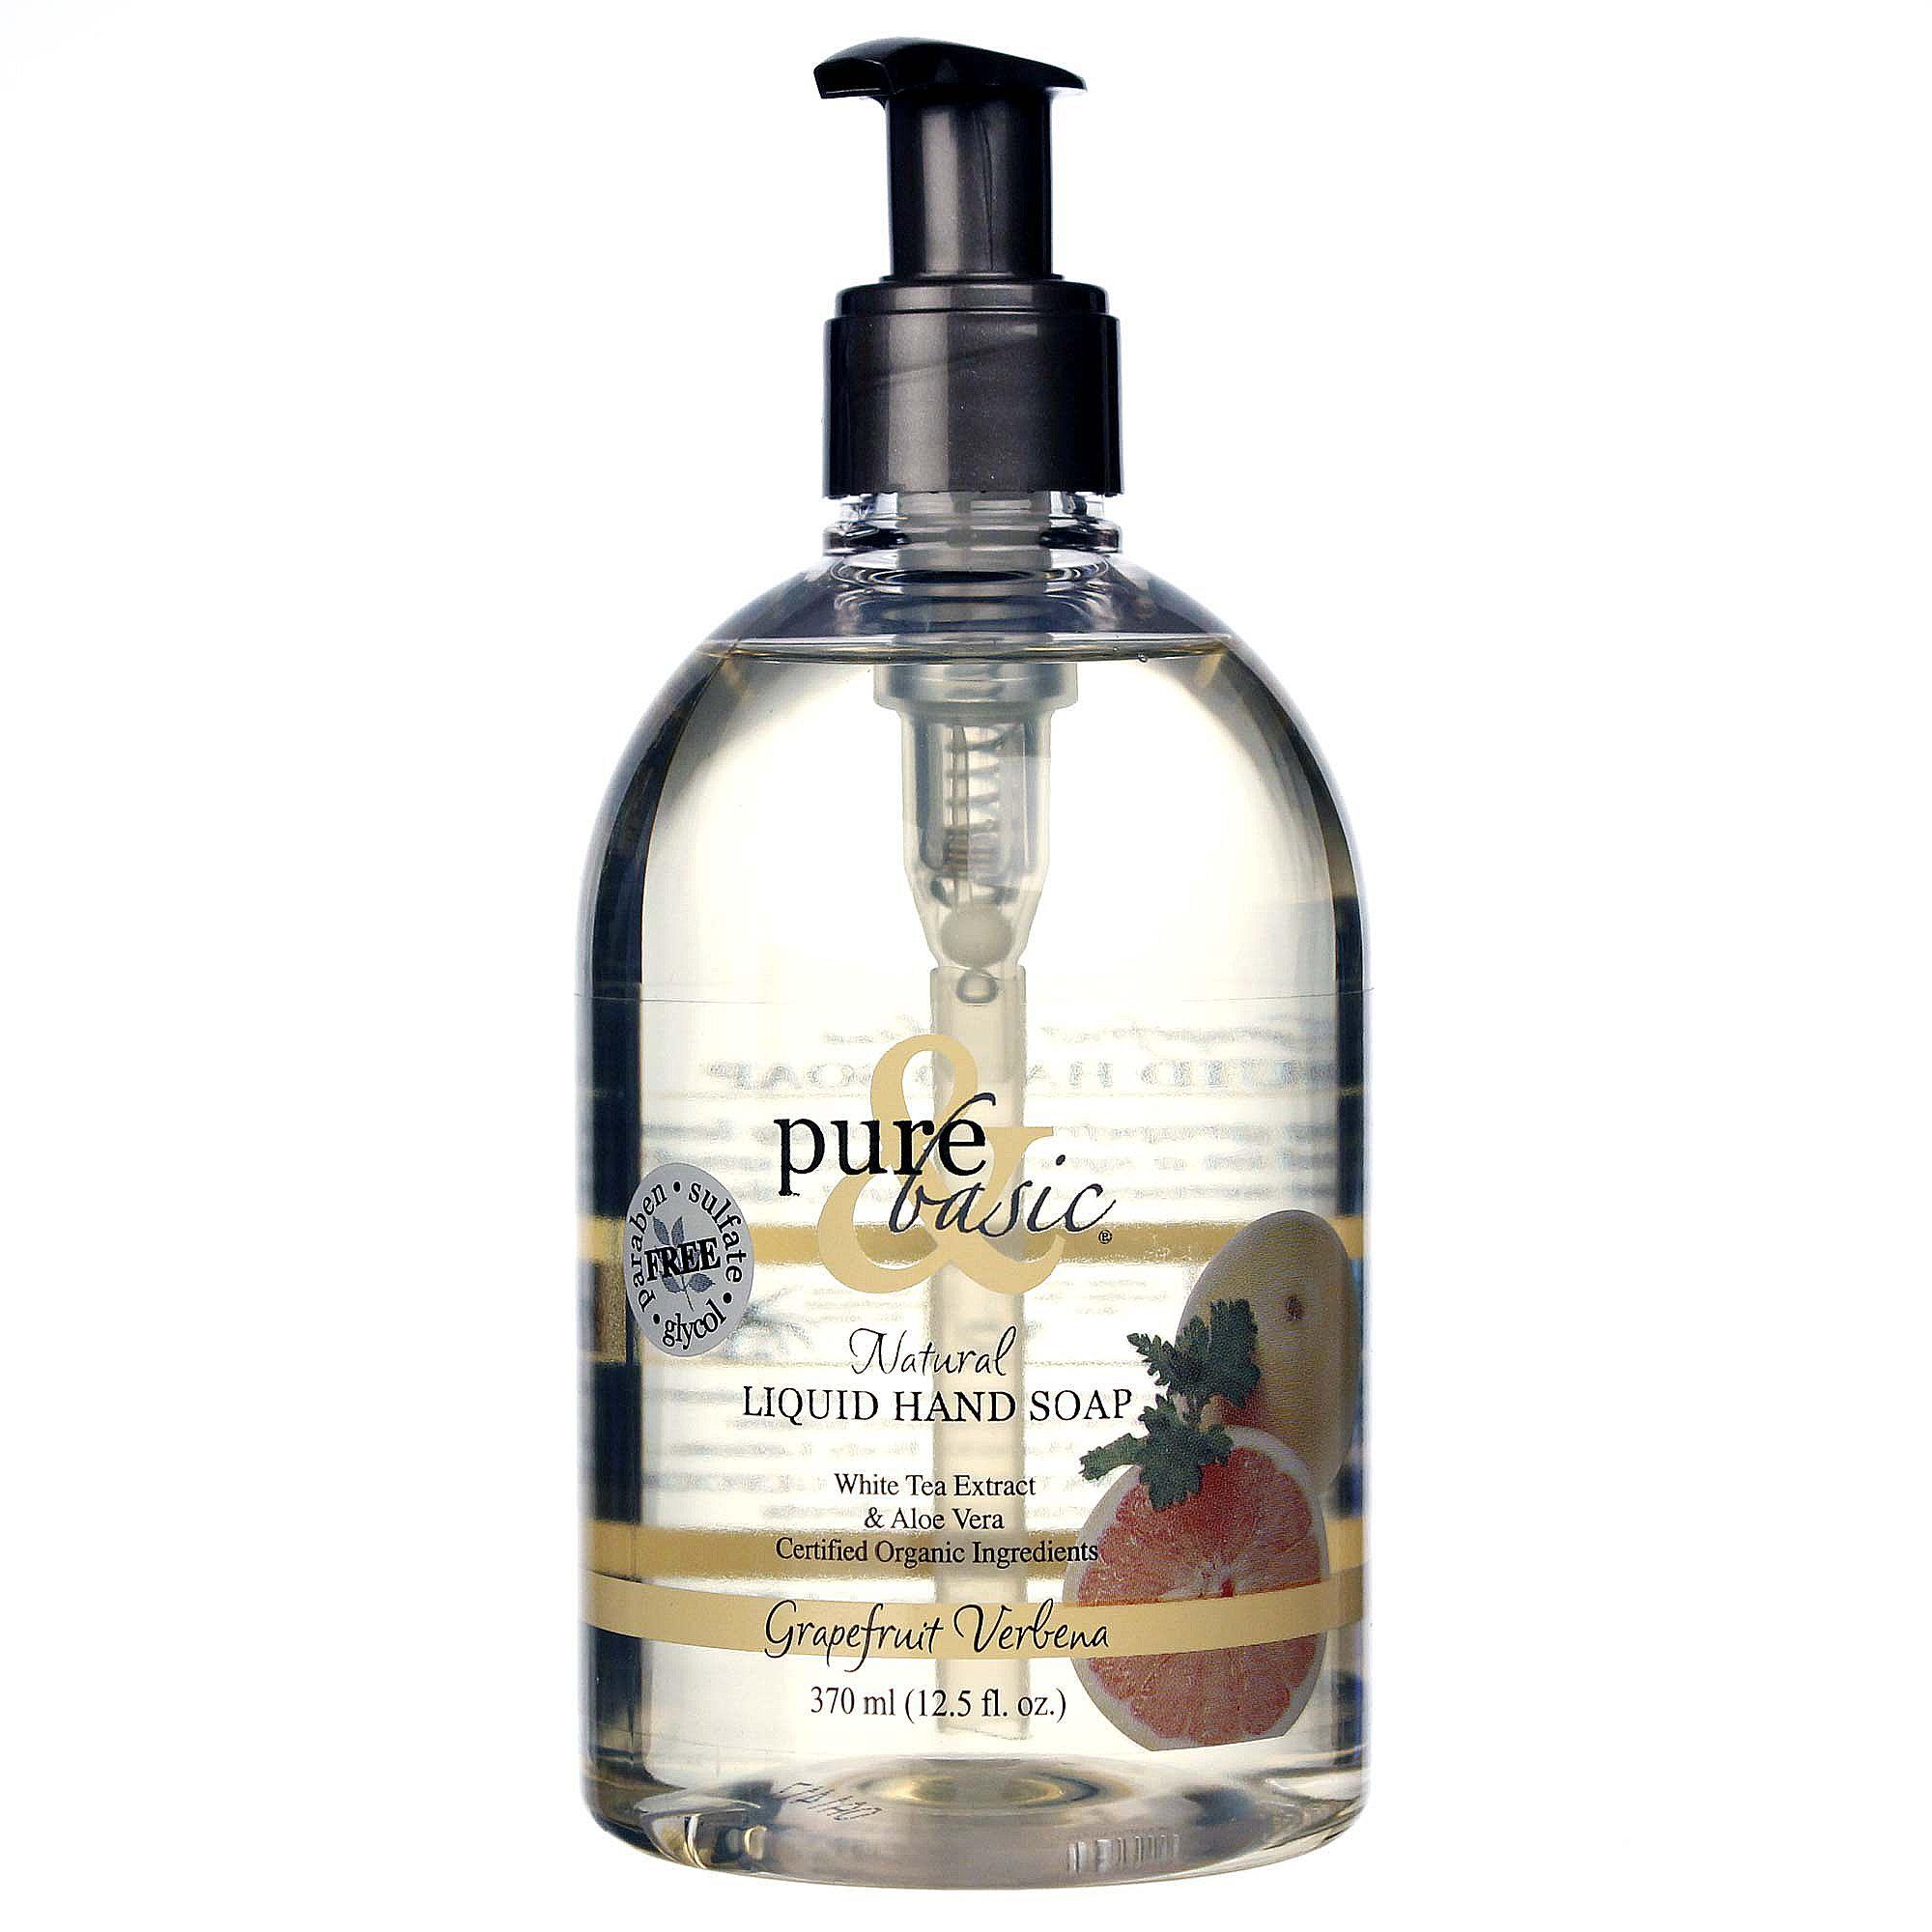 pure and basic liquid hand soap grapefruit verbena 12 5. Black Bedroom Furniture Sets. Home Design Ideas